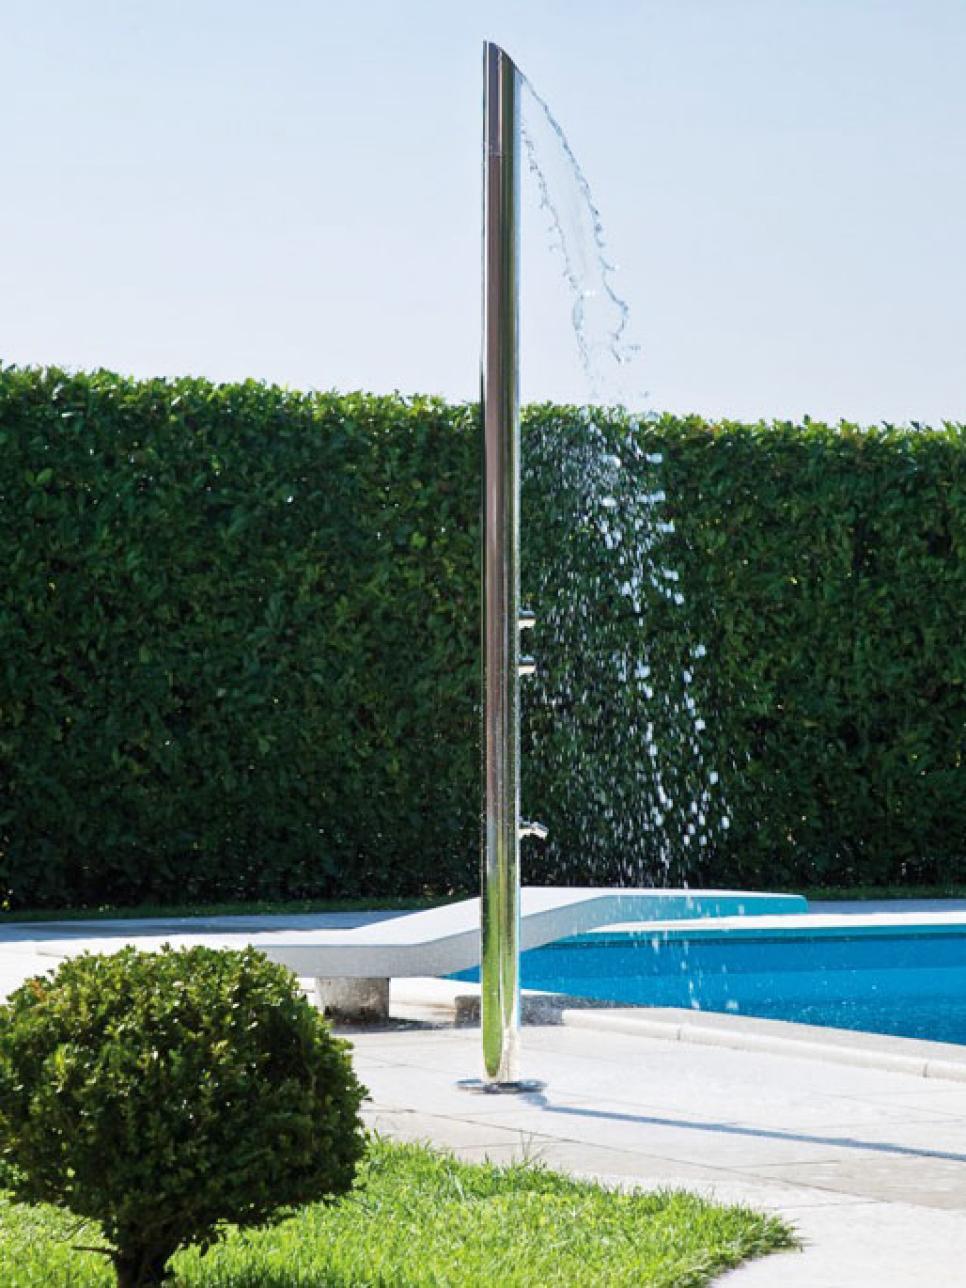 Poolside Showers Hgtv